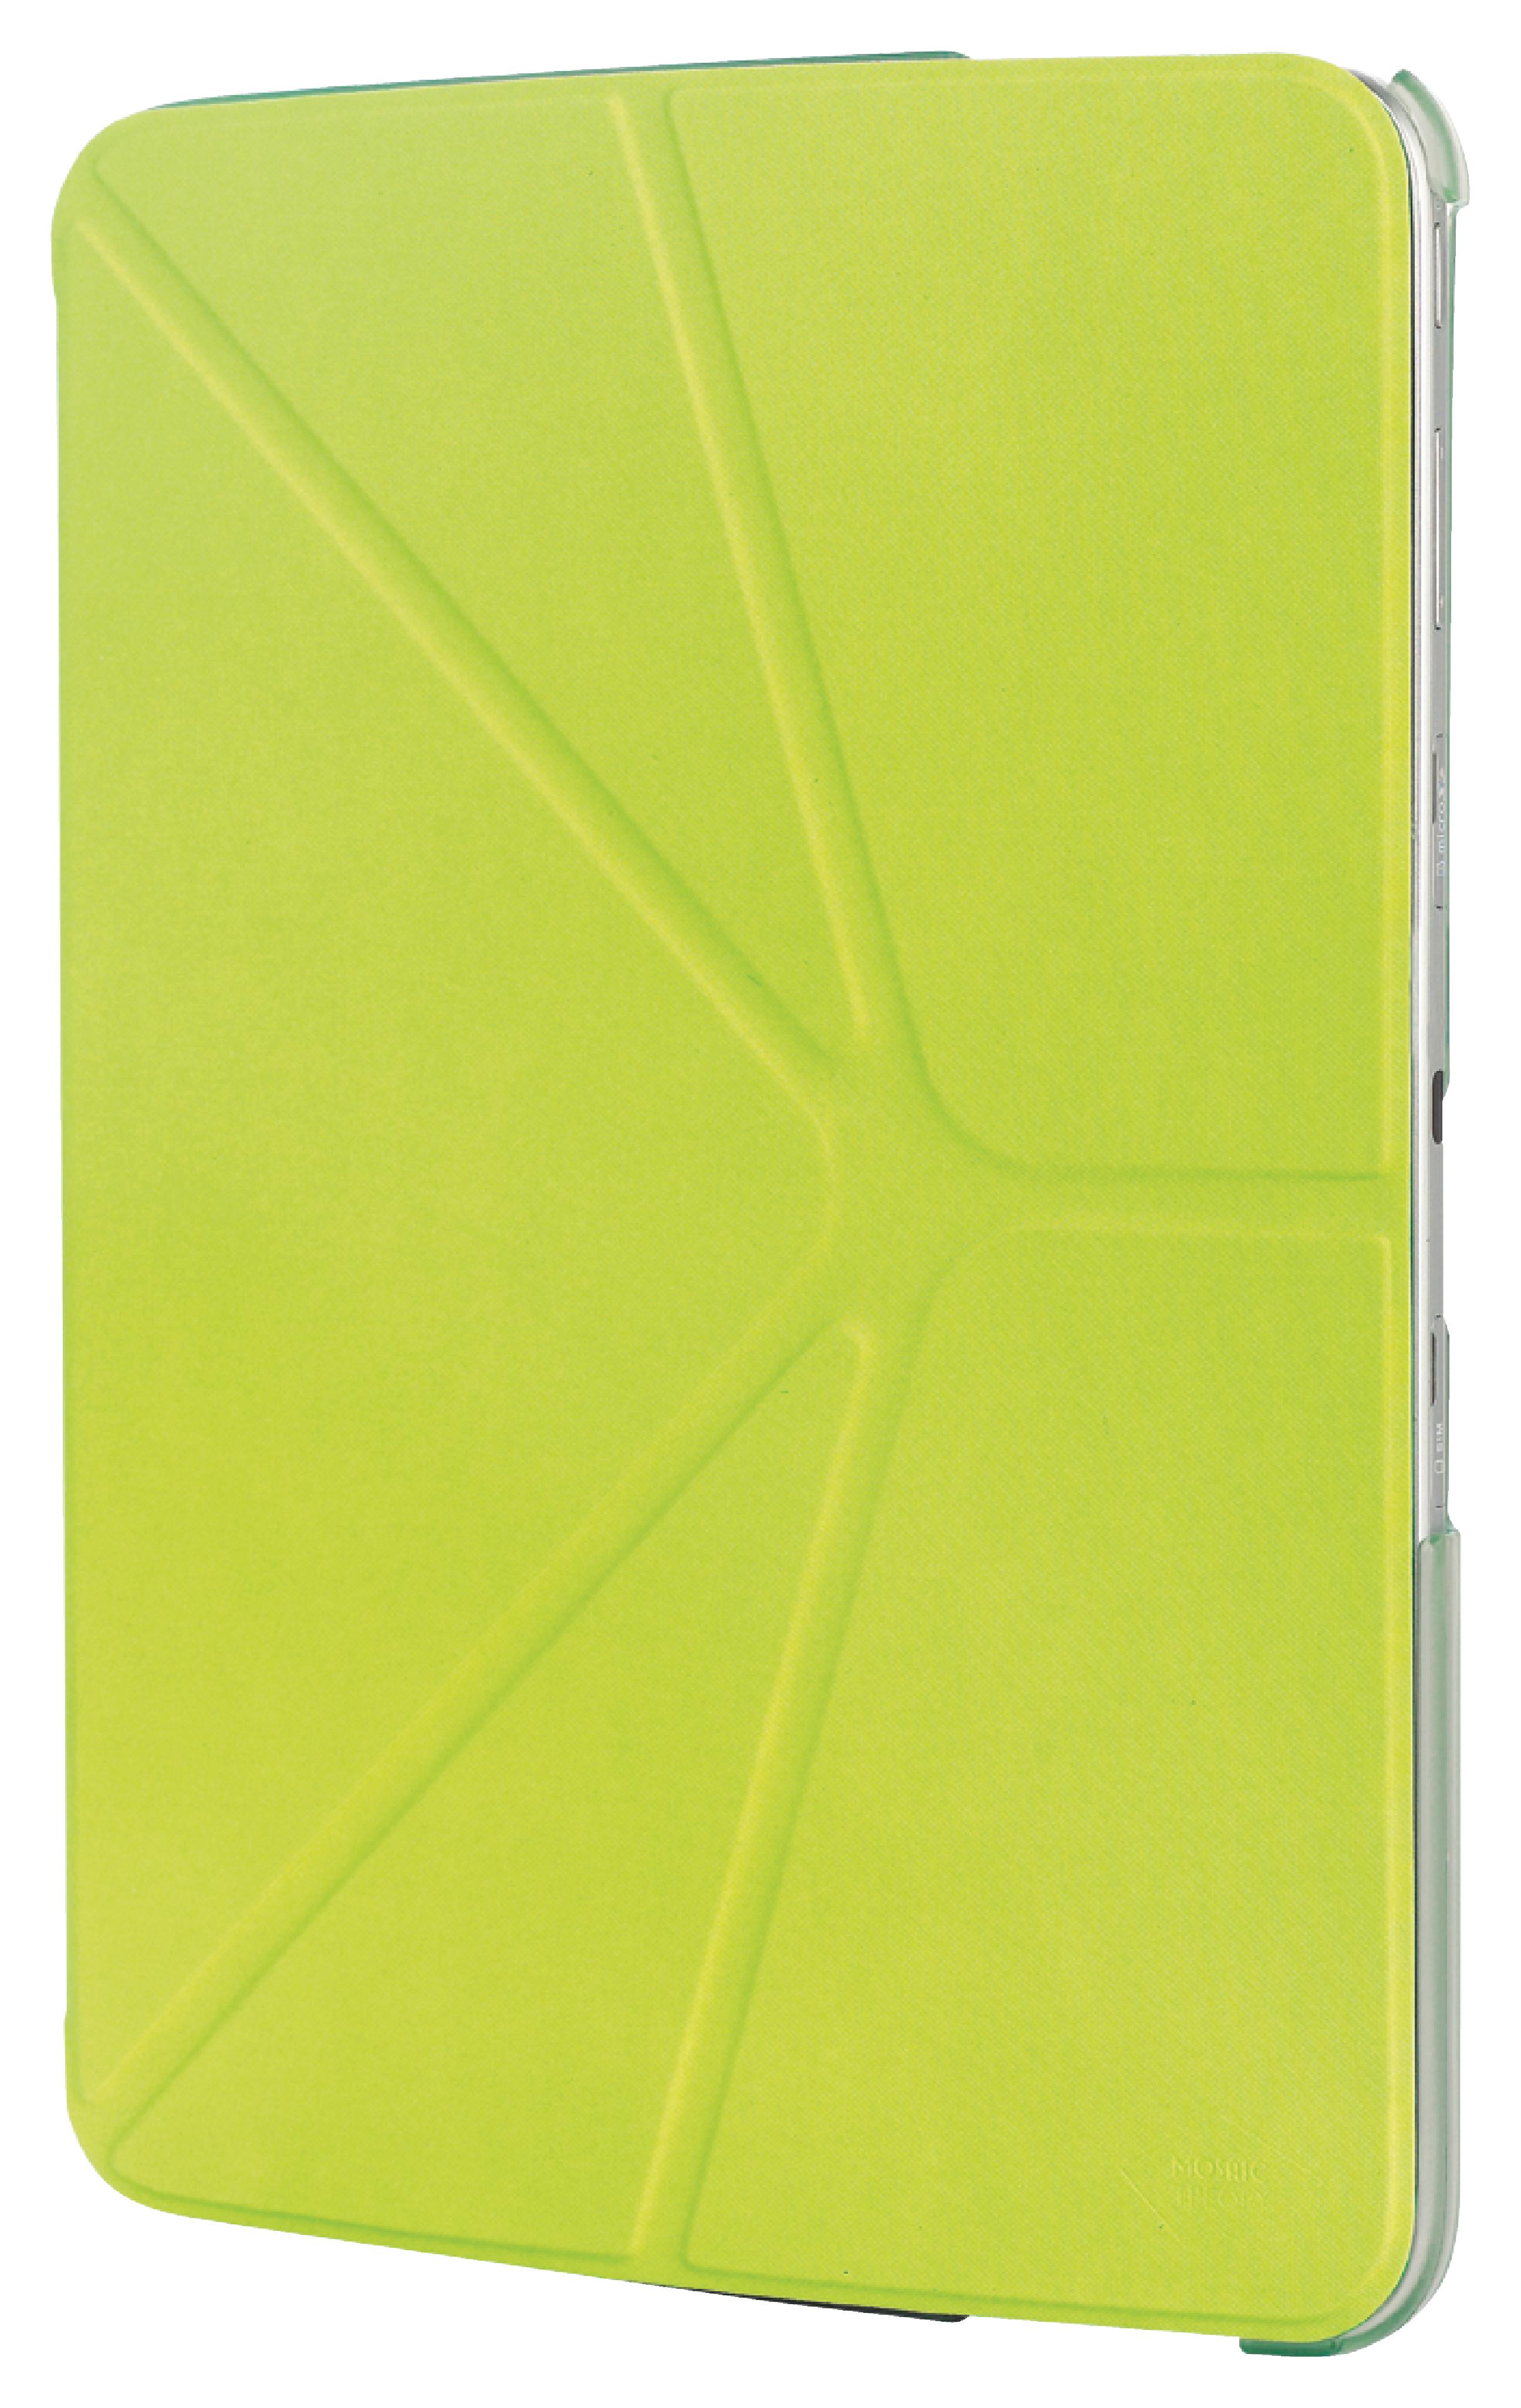 "Billede af Tablet Folie Samsung Galaxy Tab 3 10.1"" Grøn"